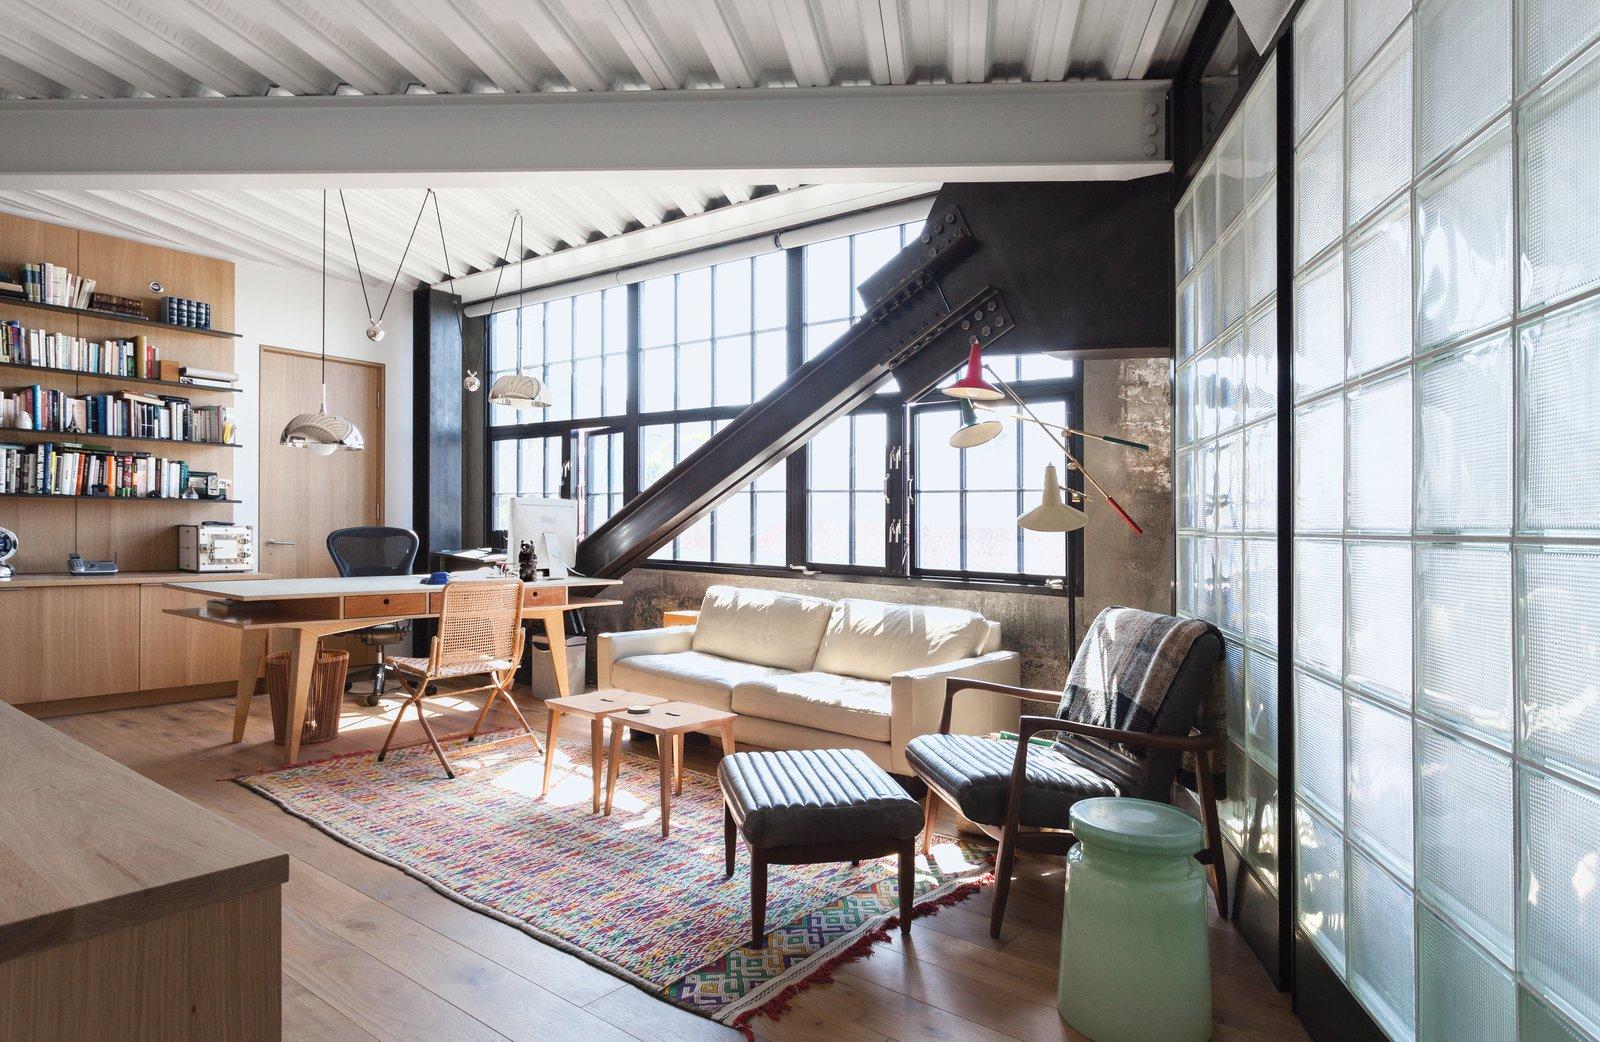 Dwell A San Francisco Renovation Mixes Industrial And